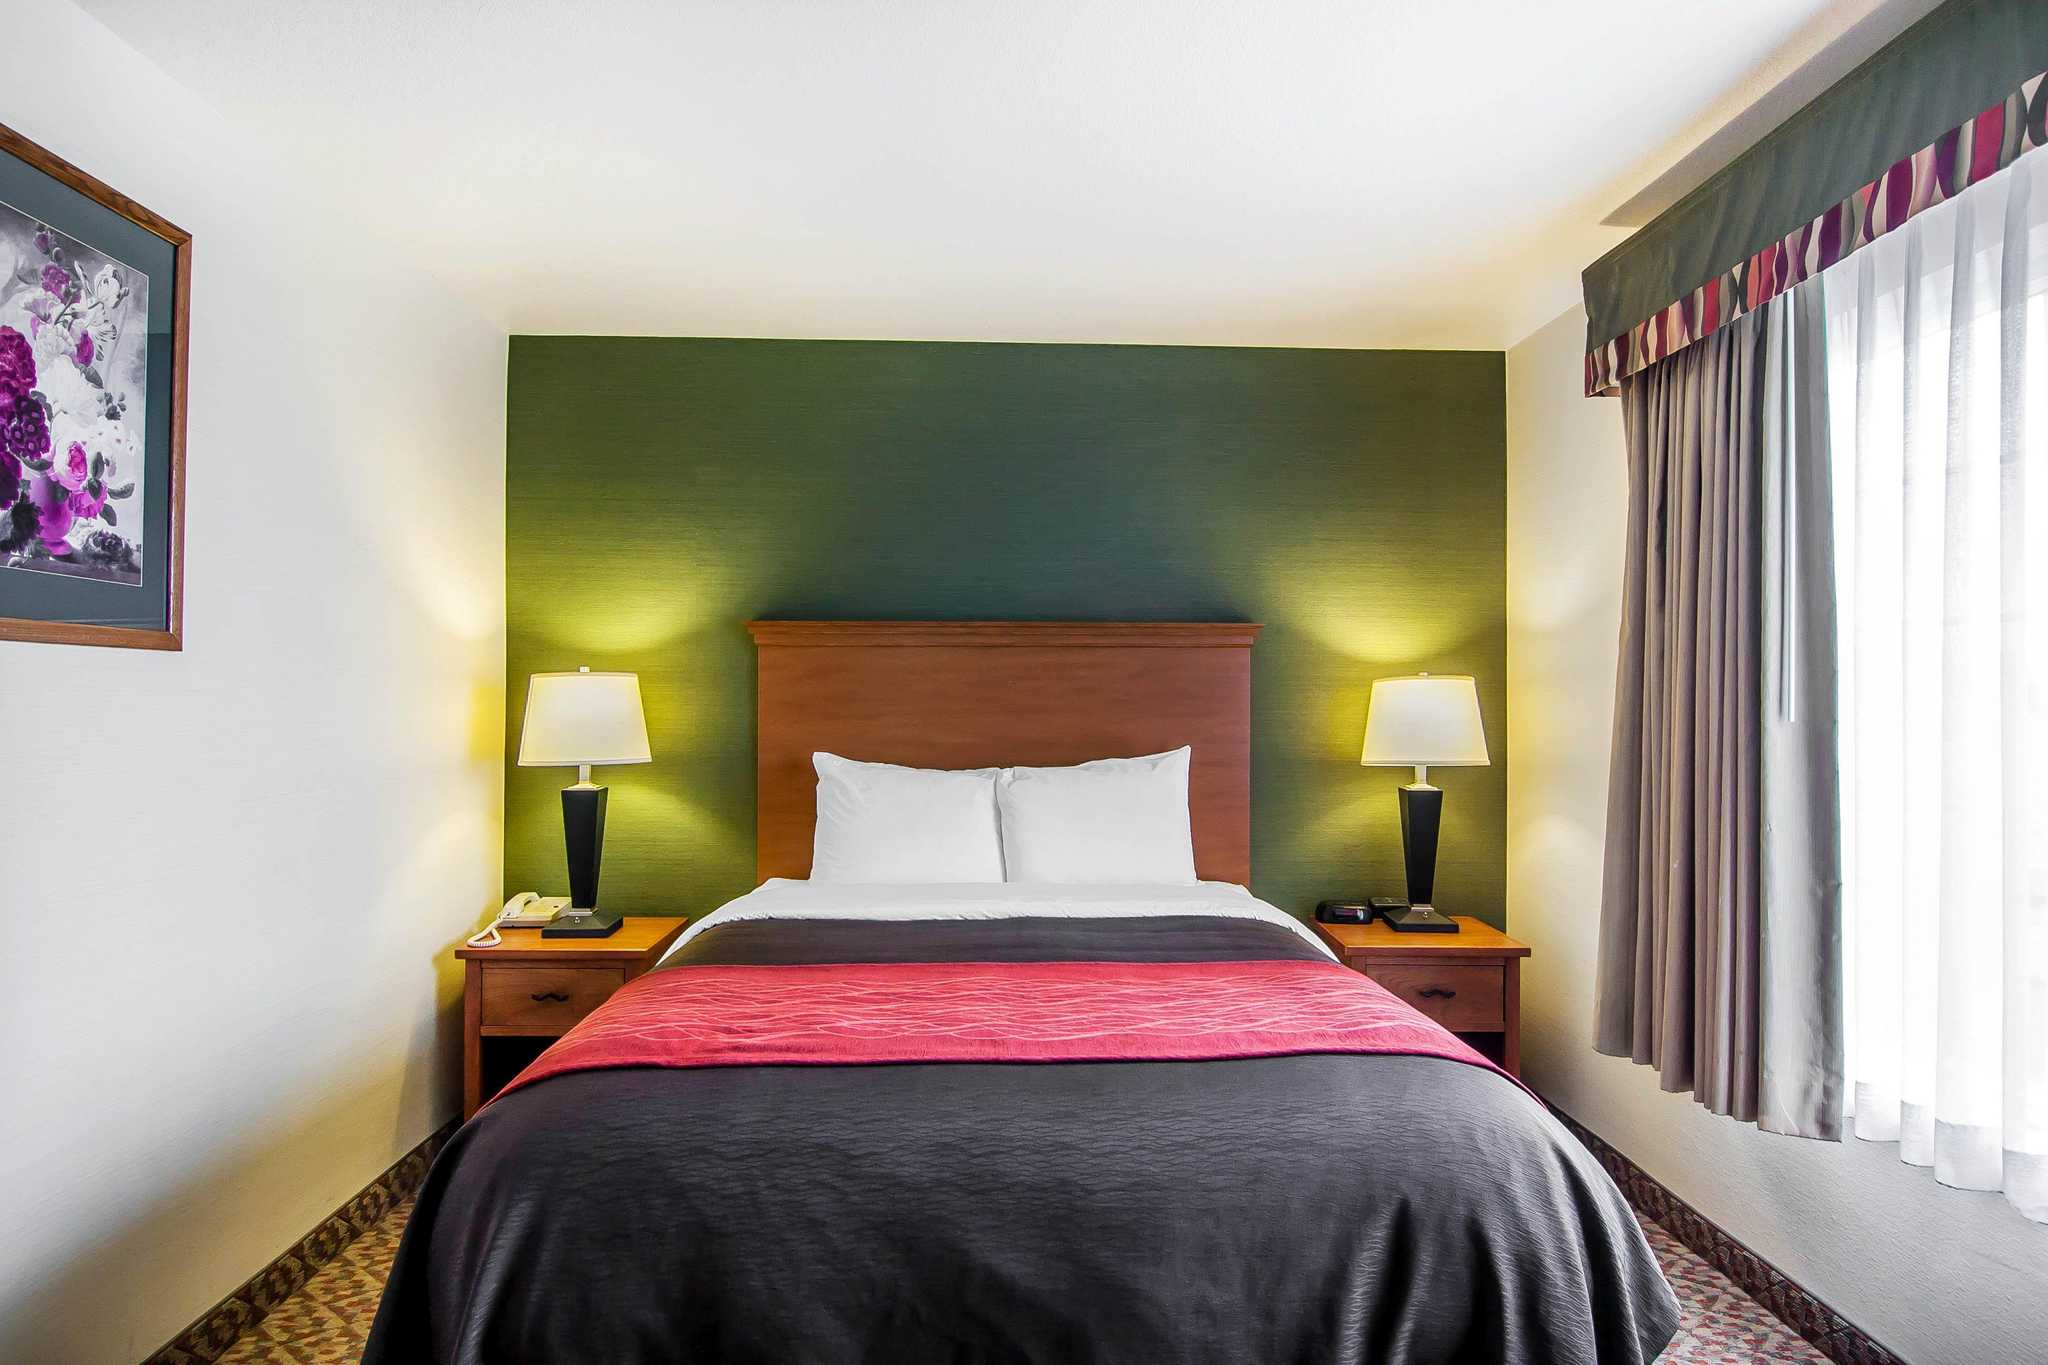 Comfort Inn & Suites image 50